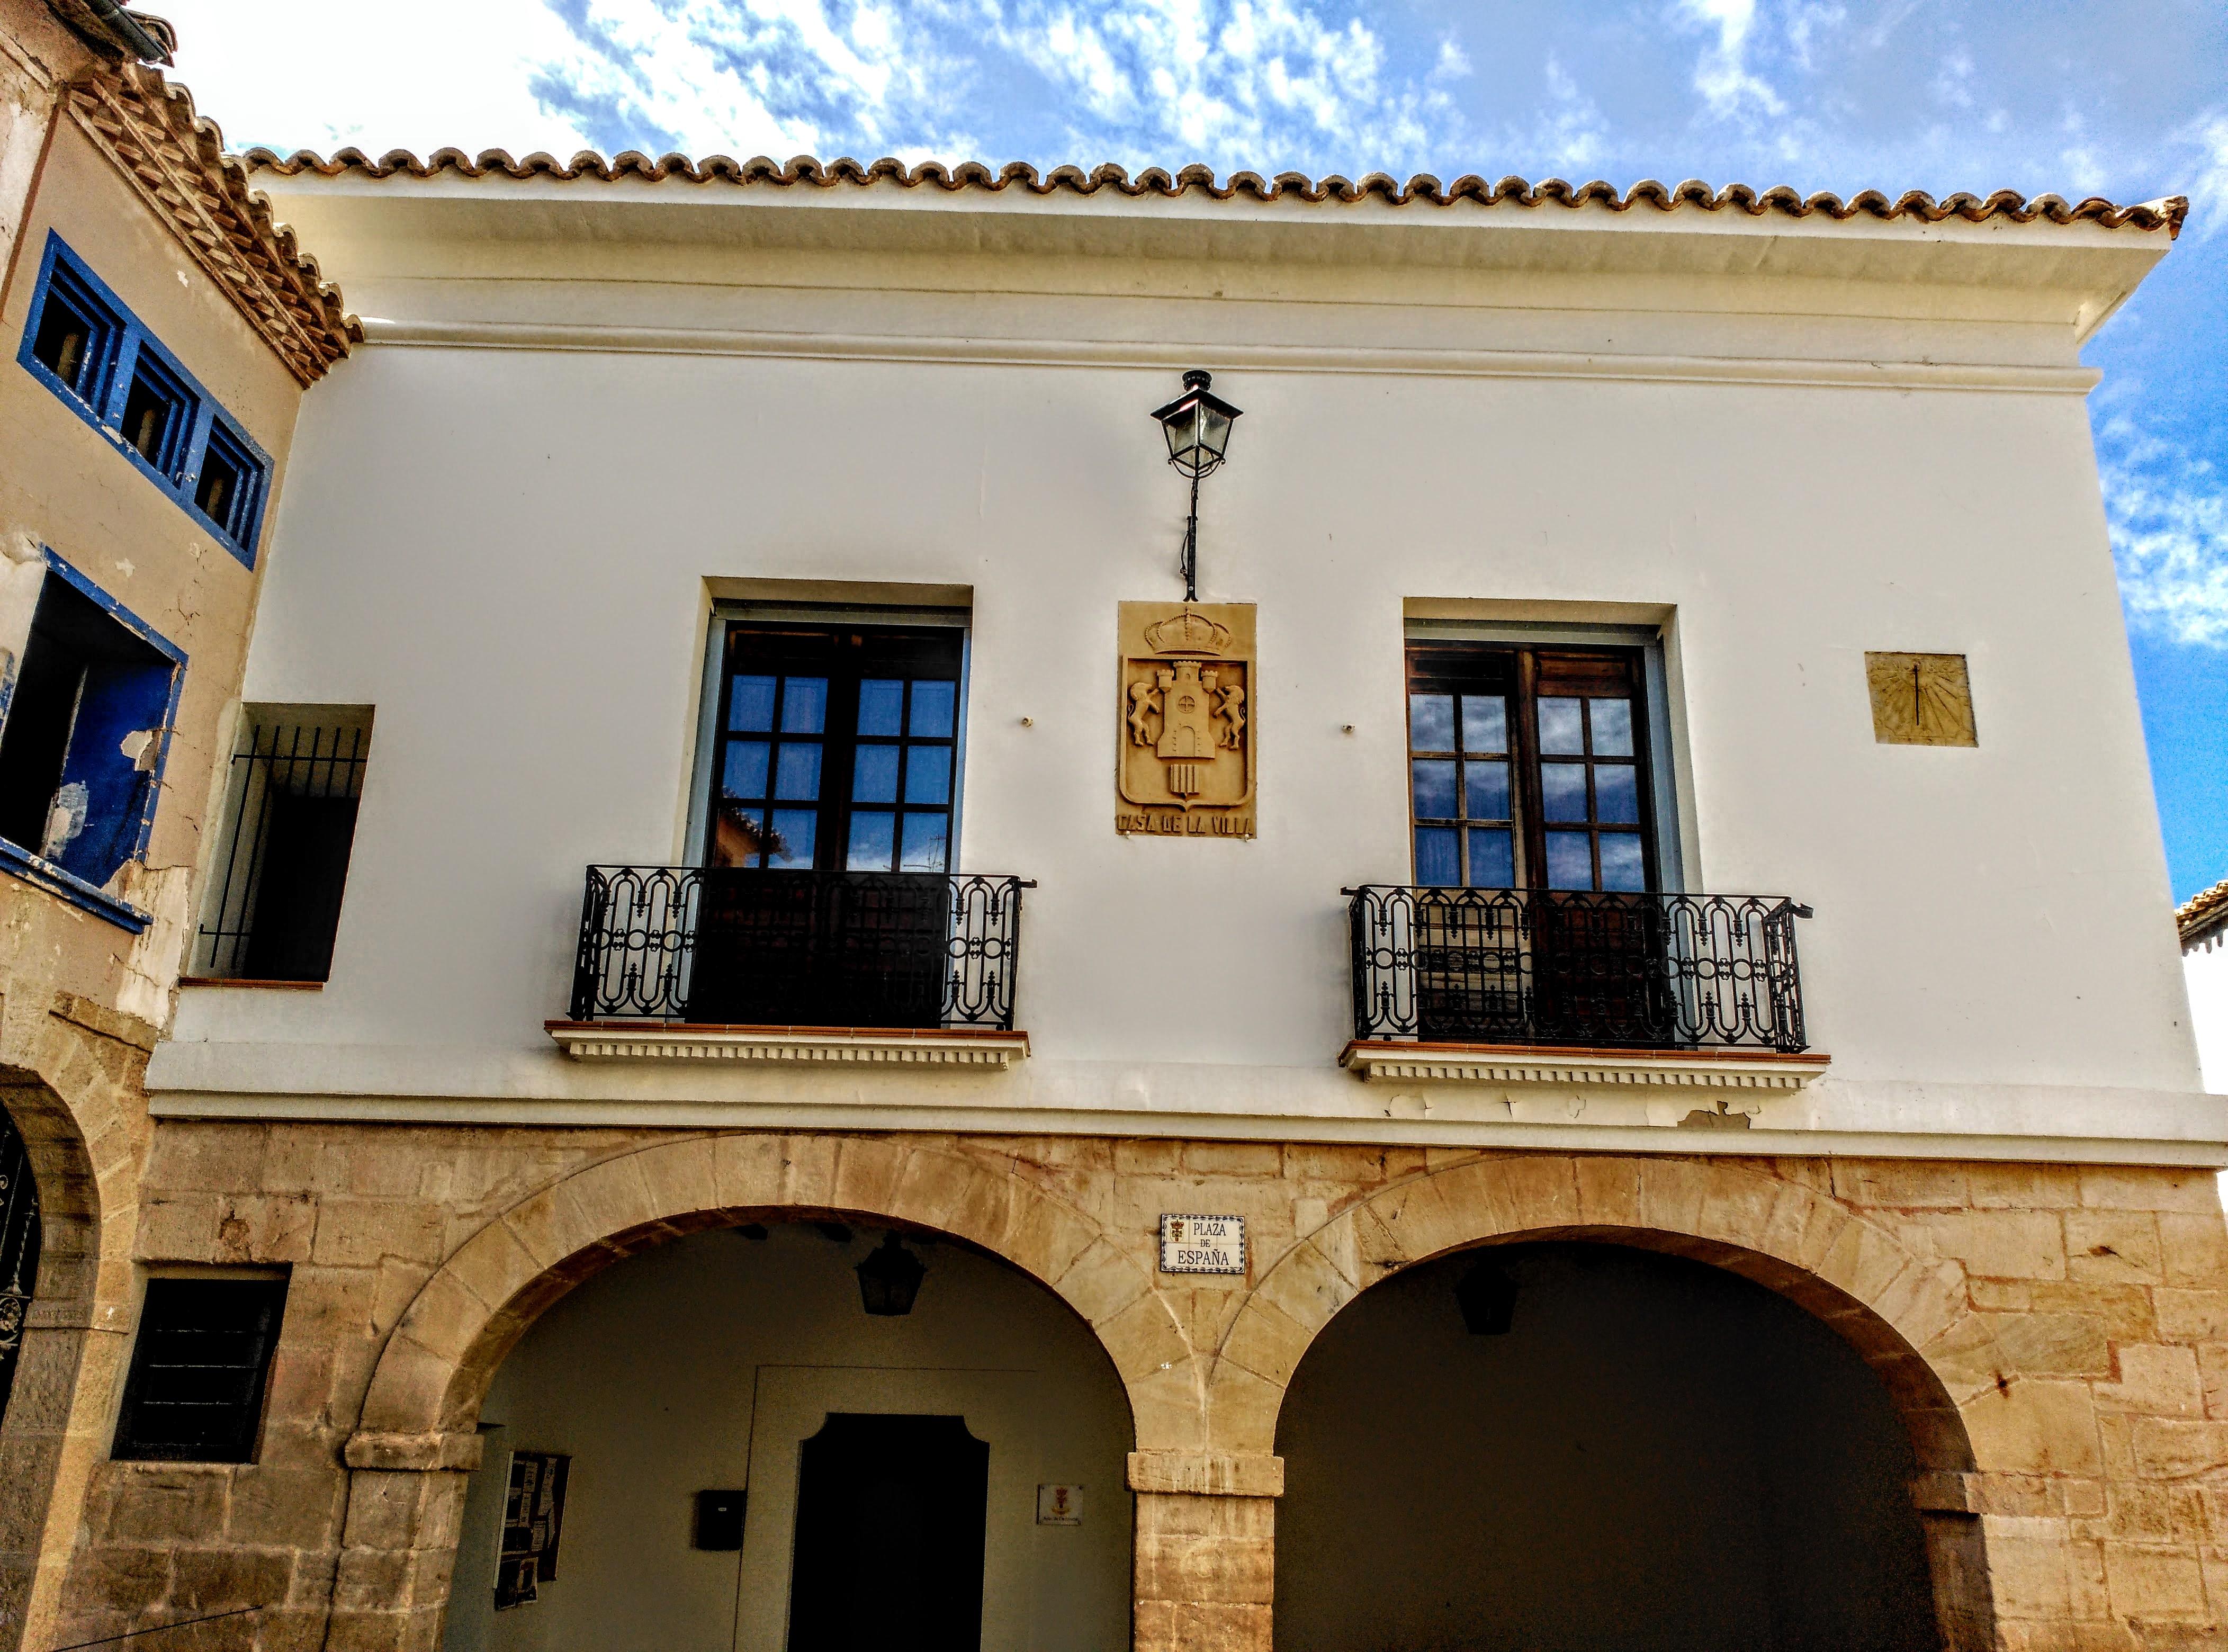 grupos municipales de Castelserás